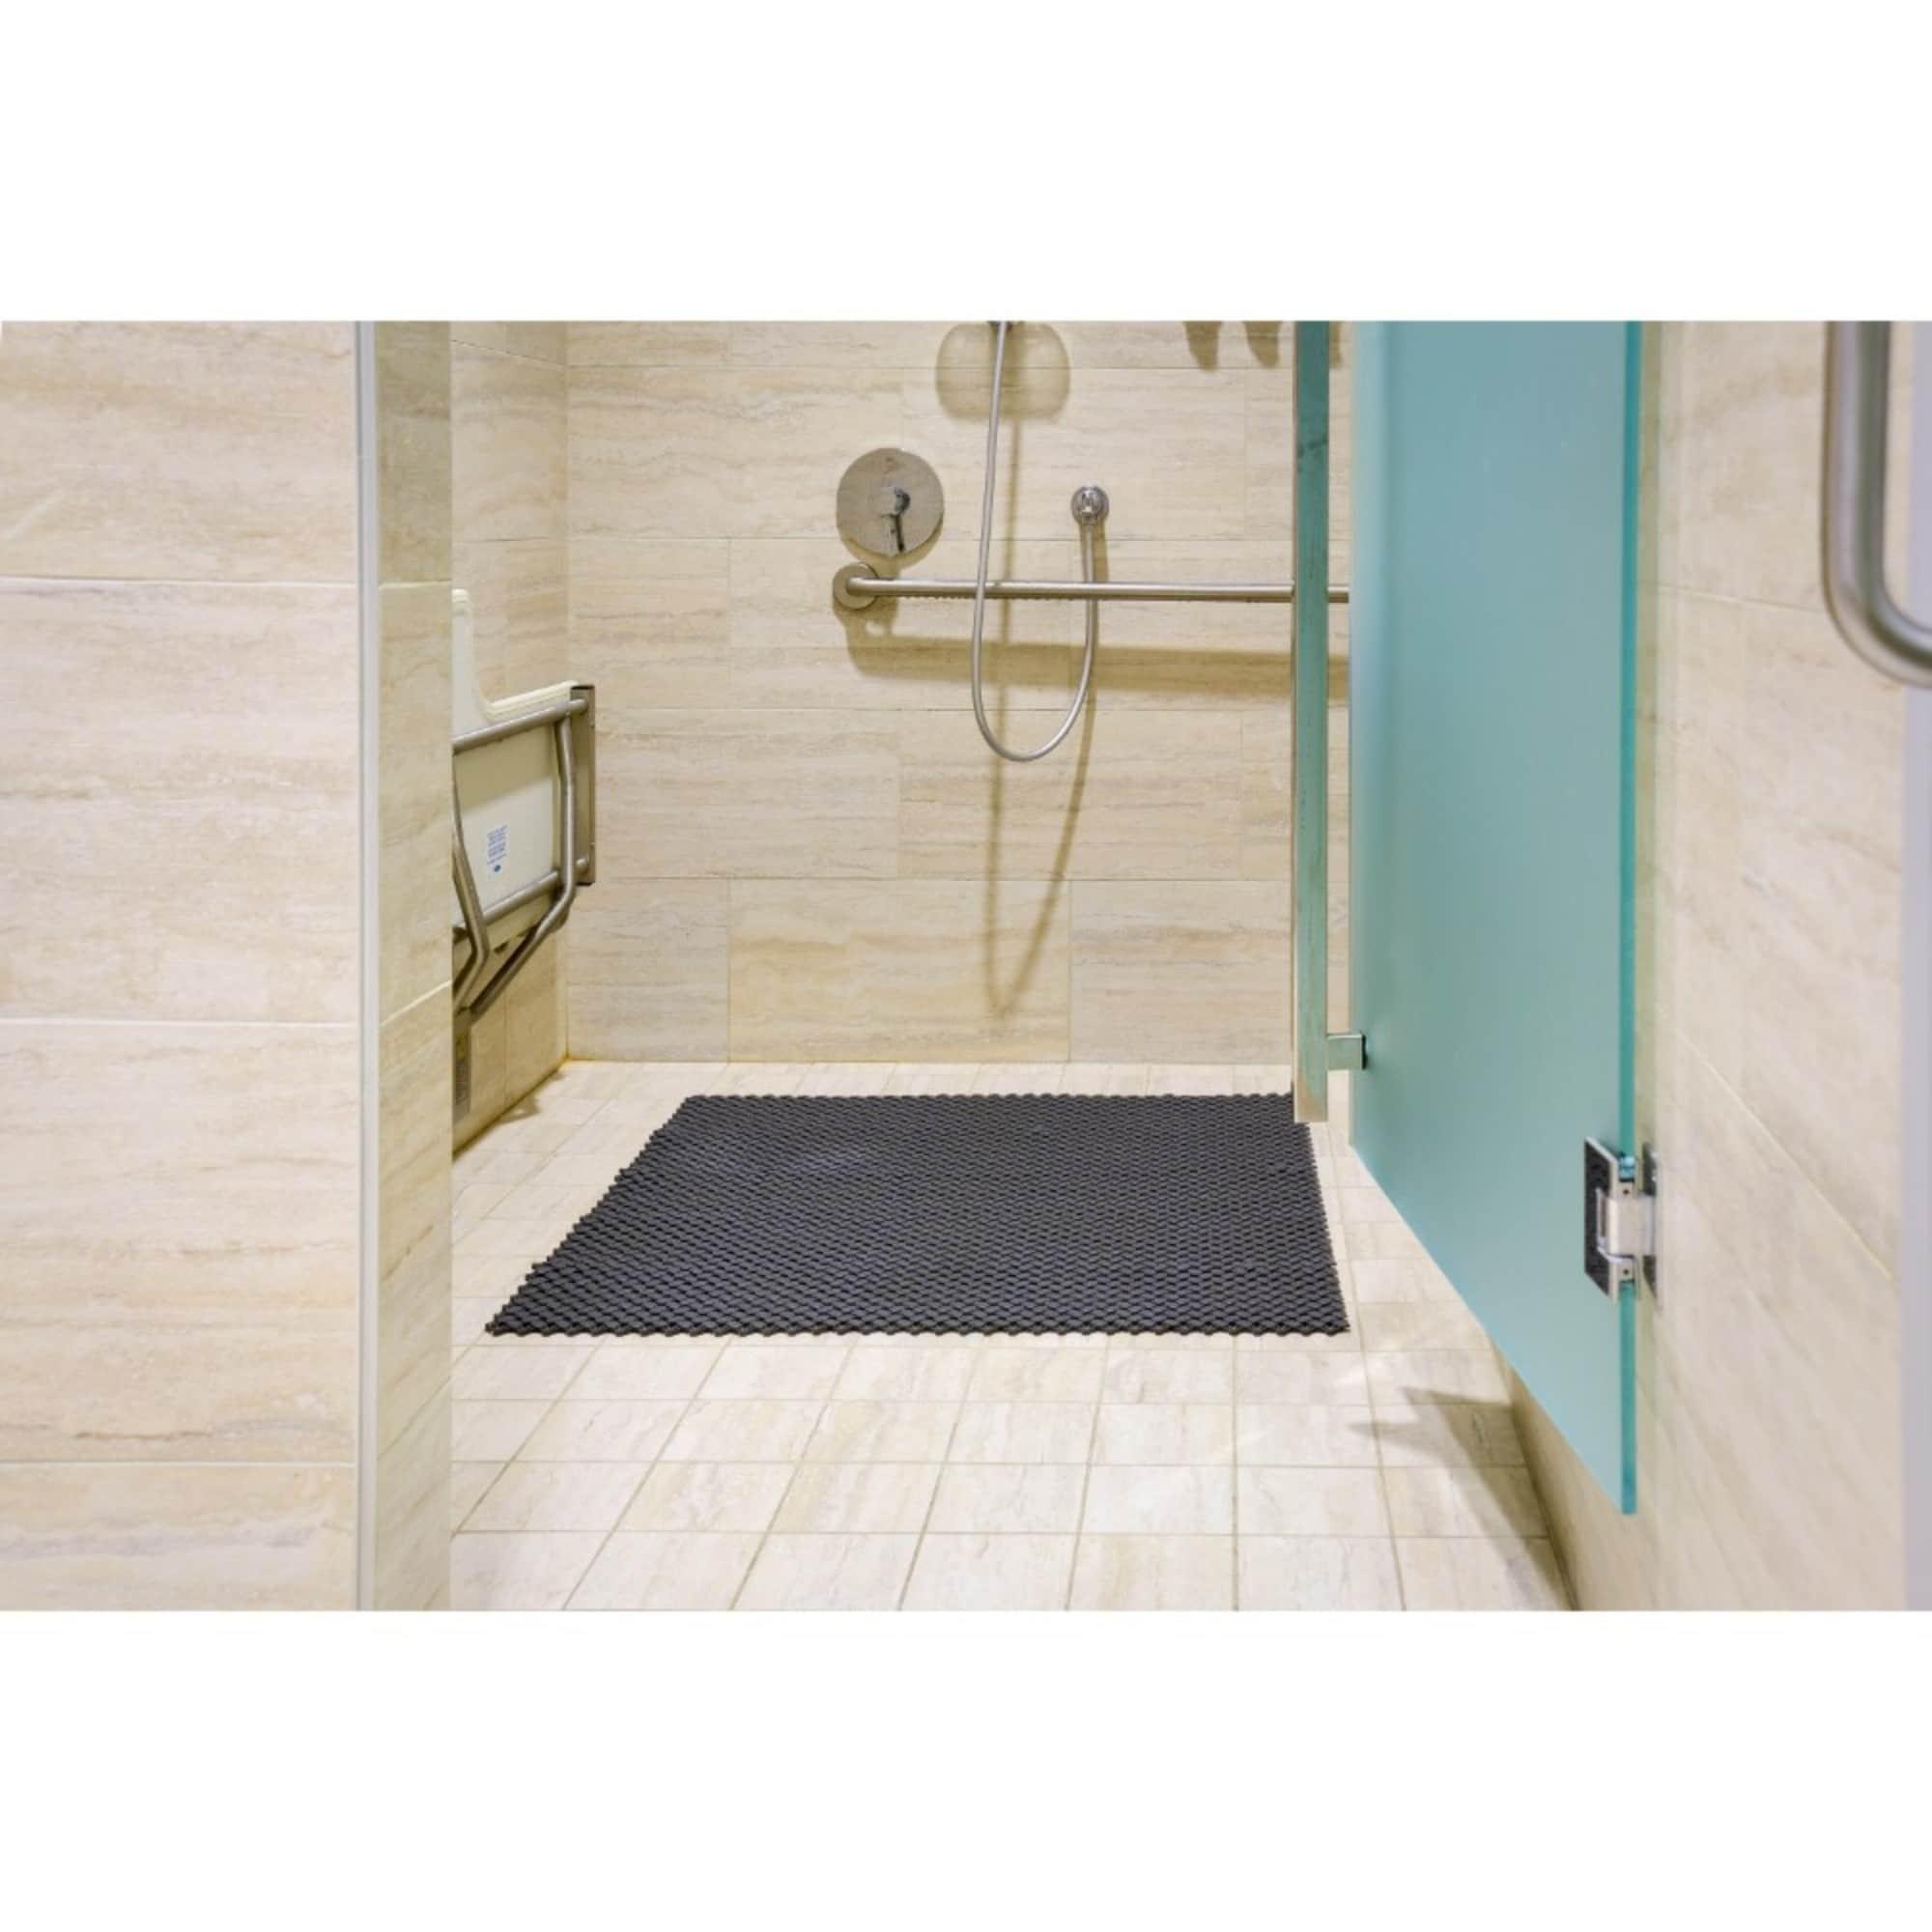 Shop Mats Inc Aqua Safe Wet Area Interlocking Floor Tile 8 X 8